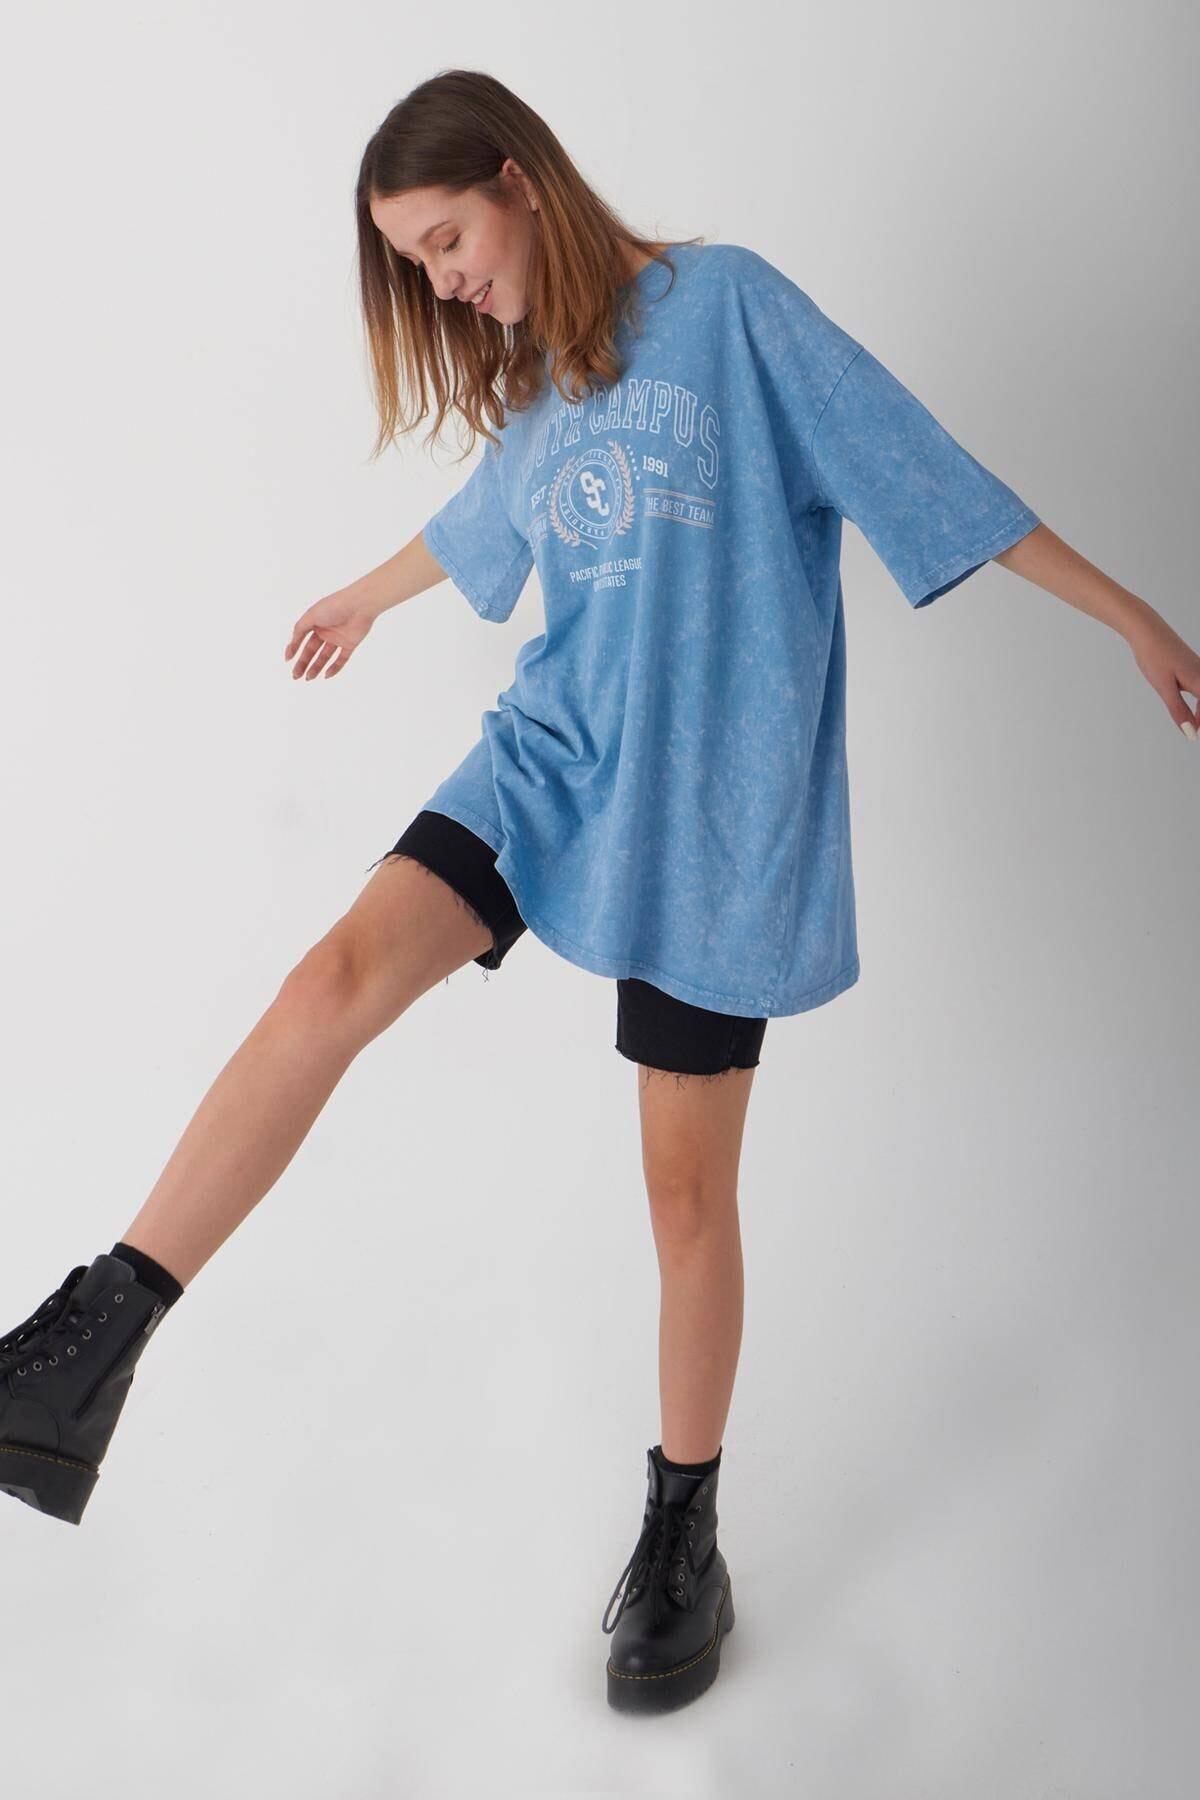 Addax Baskılı Oversize T-shirt P1049 - L5 1